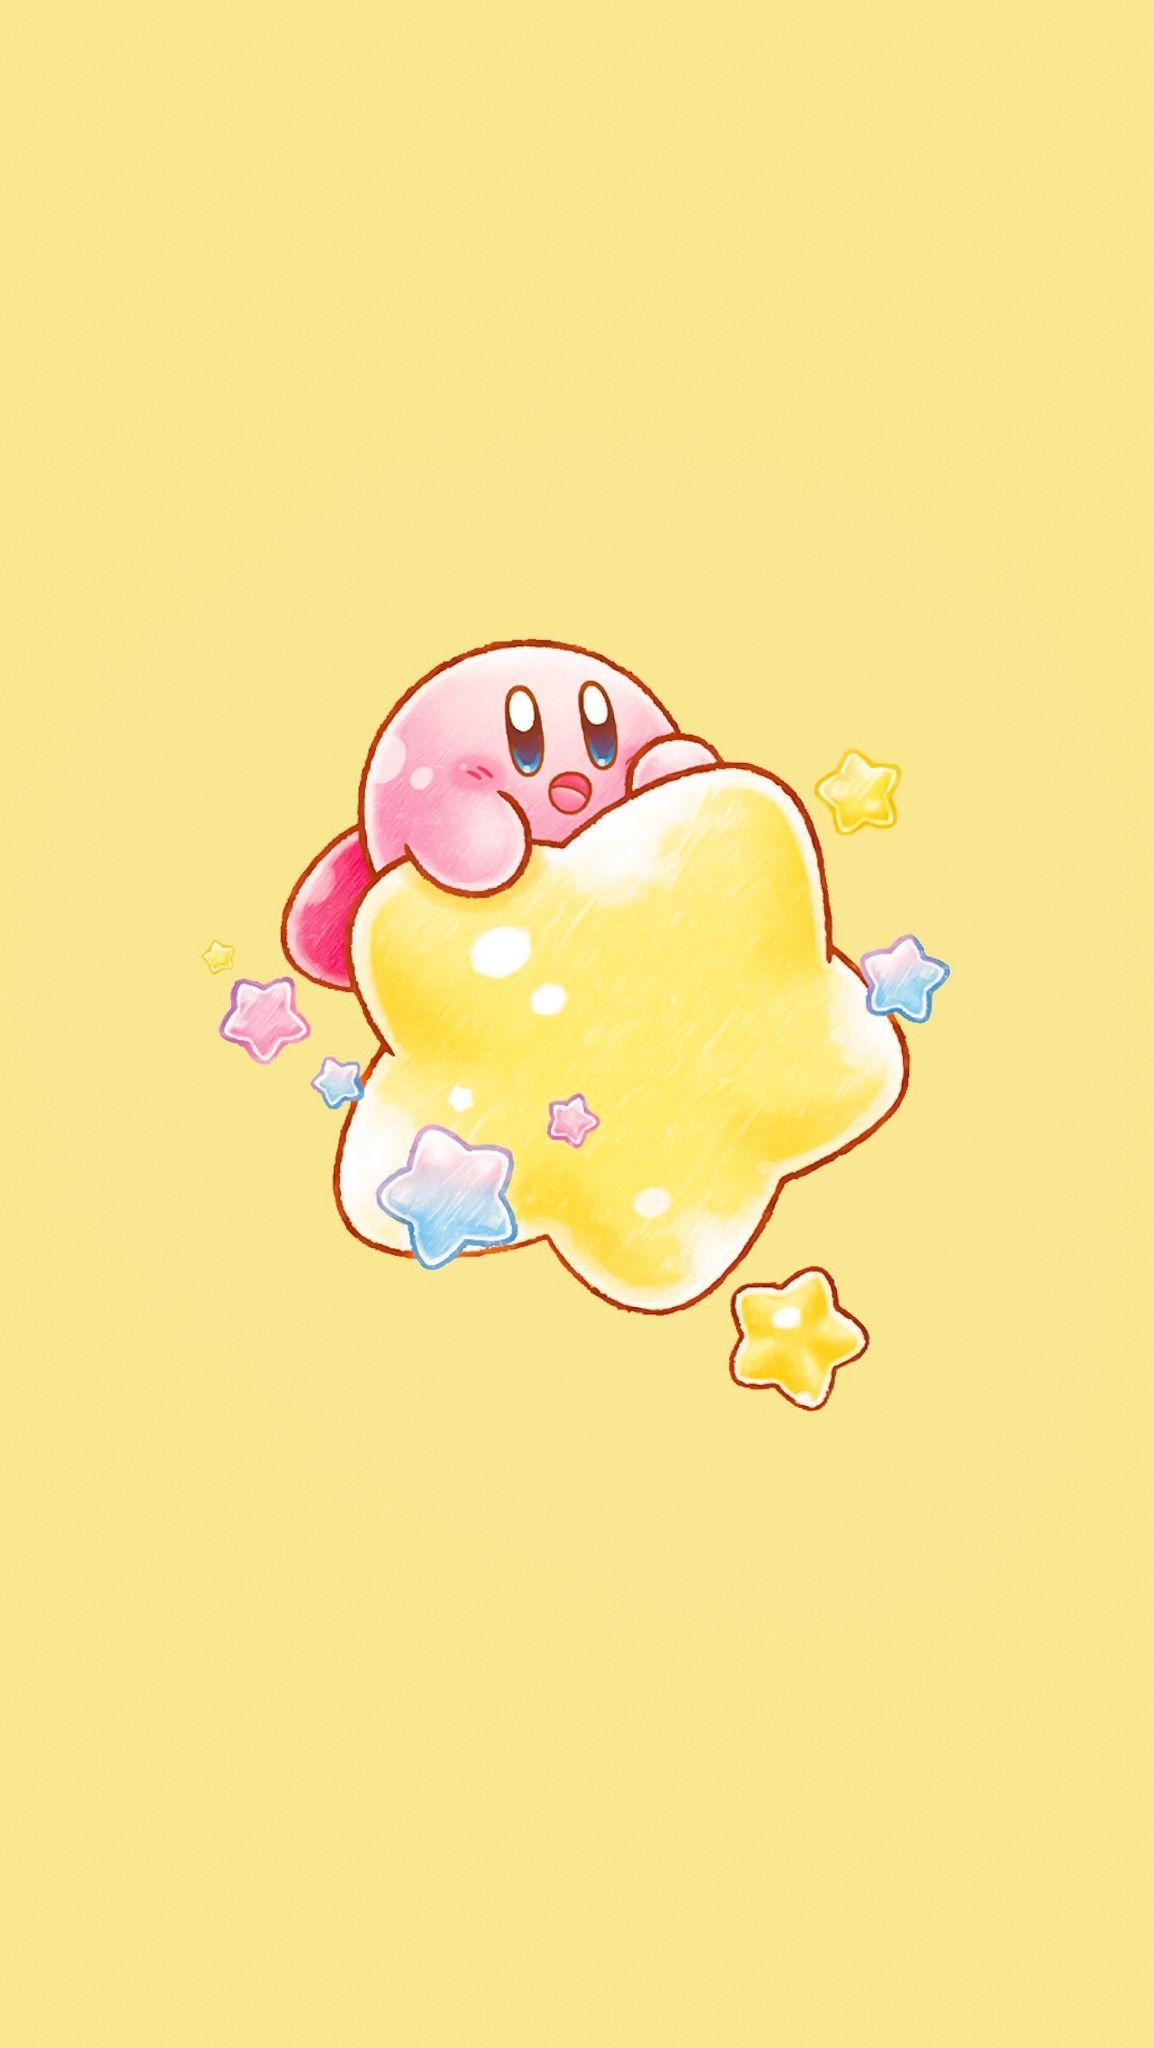 Pin By Veronika Garcia On Kirby Bg In 2020 Kawaii Wallpaper Kirby Memes Cute Wallpapers